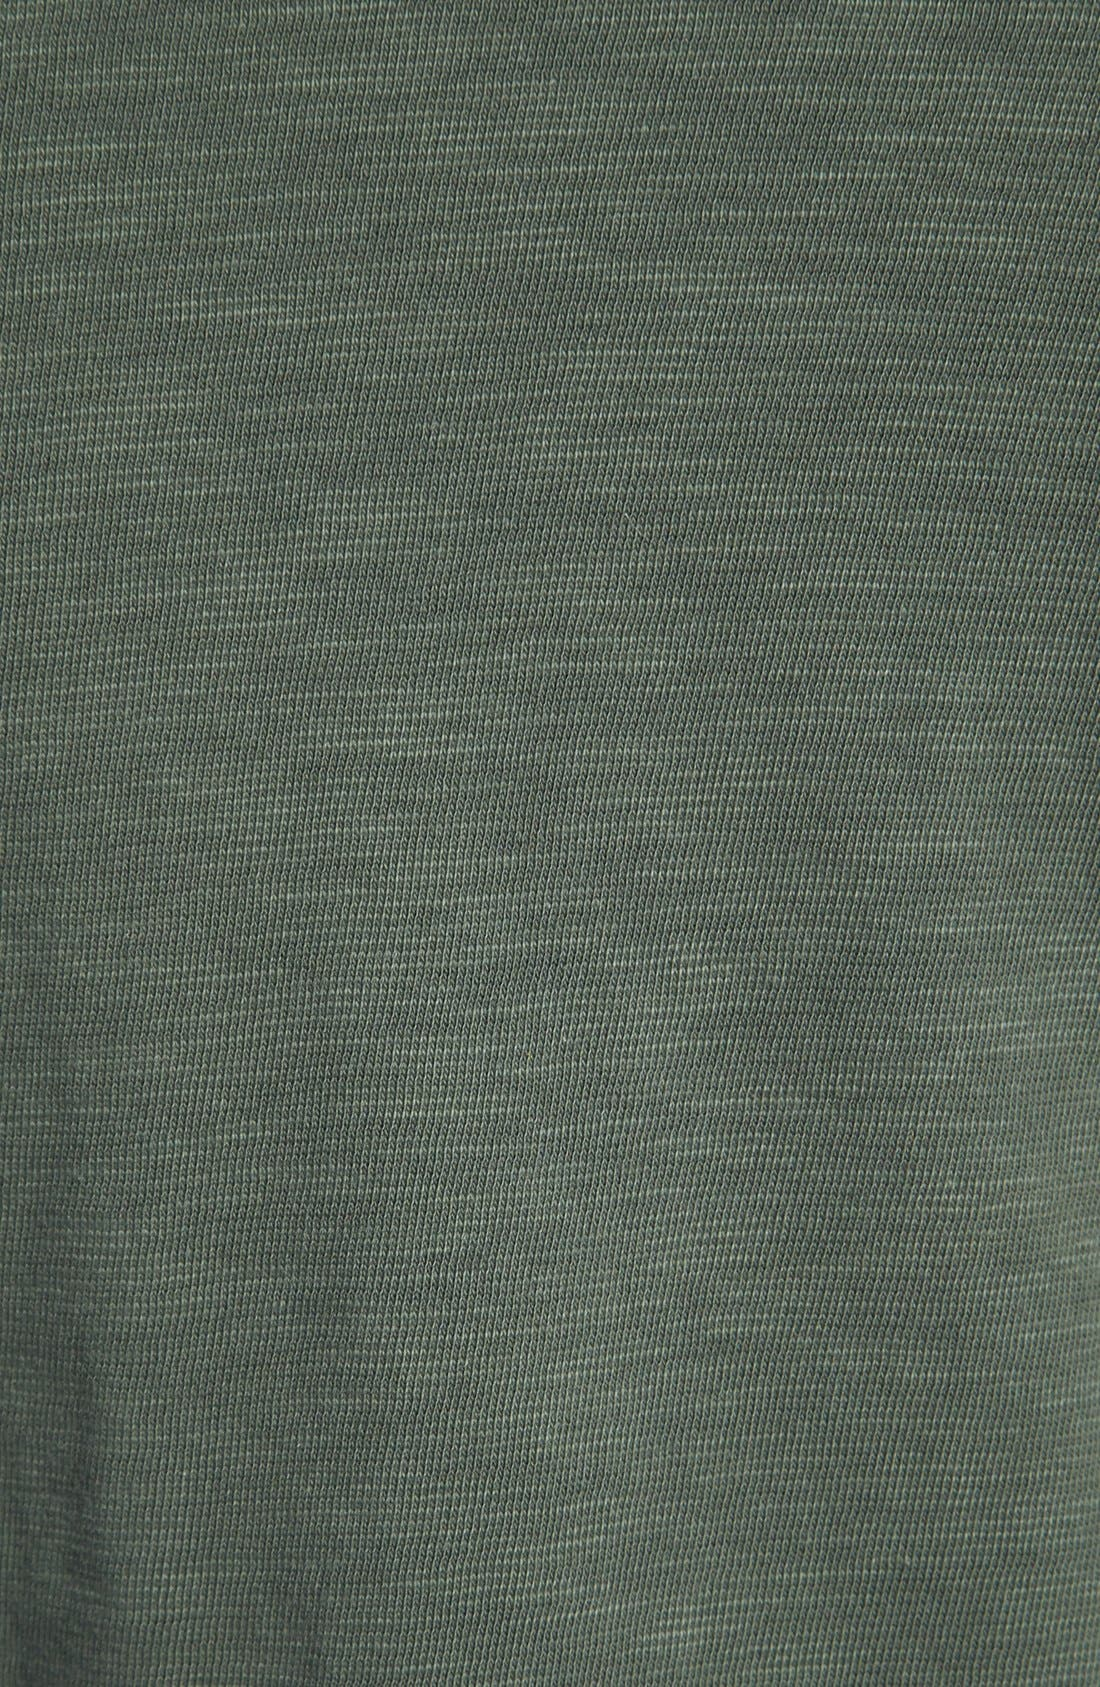 Alternate Image 3  - 47 Brand 'Slugger - Green Bay Packets' Hoodie